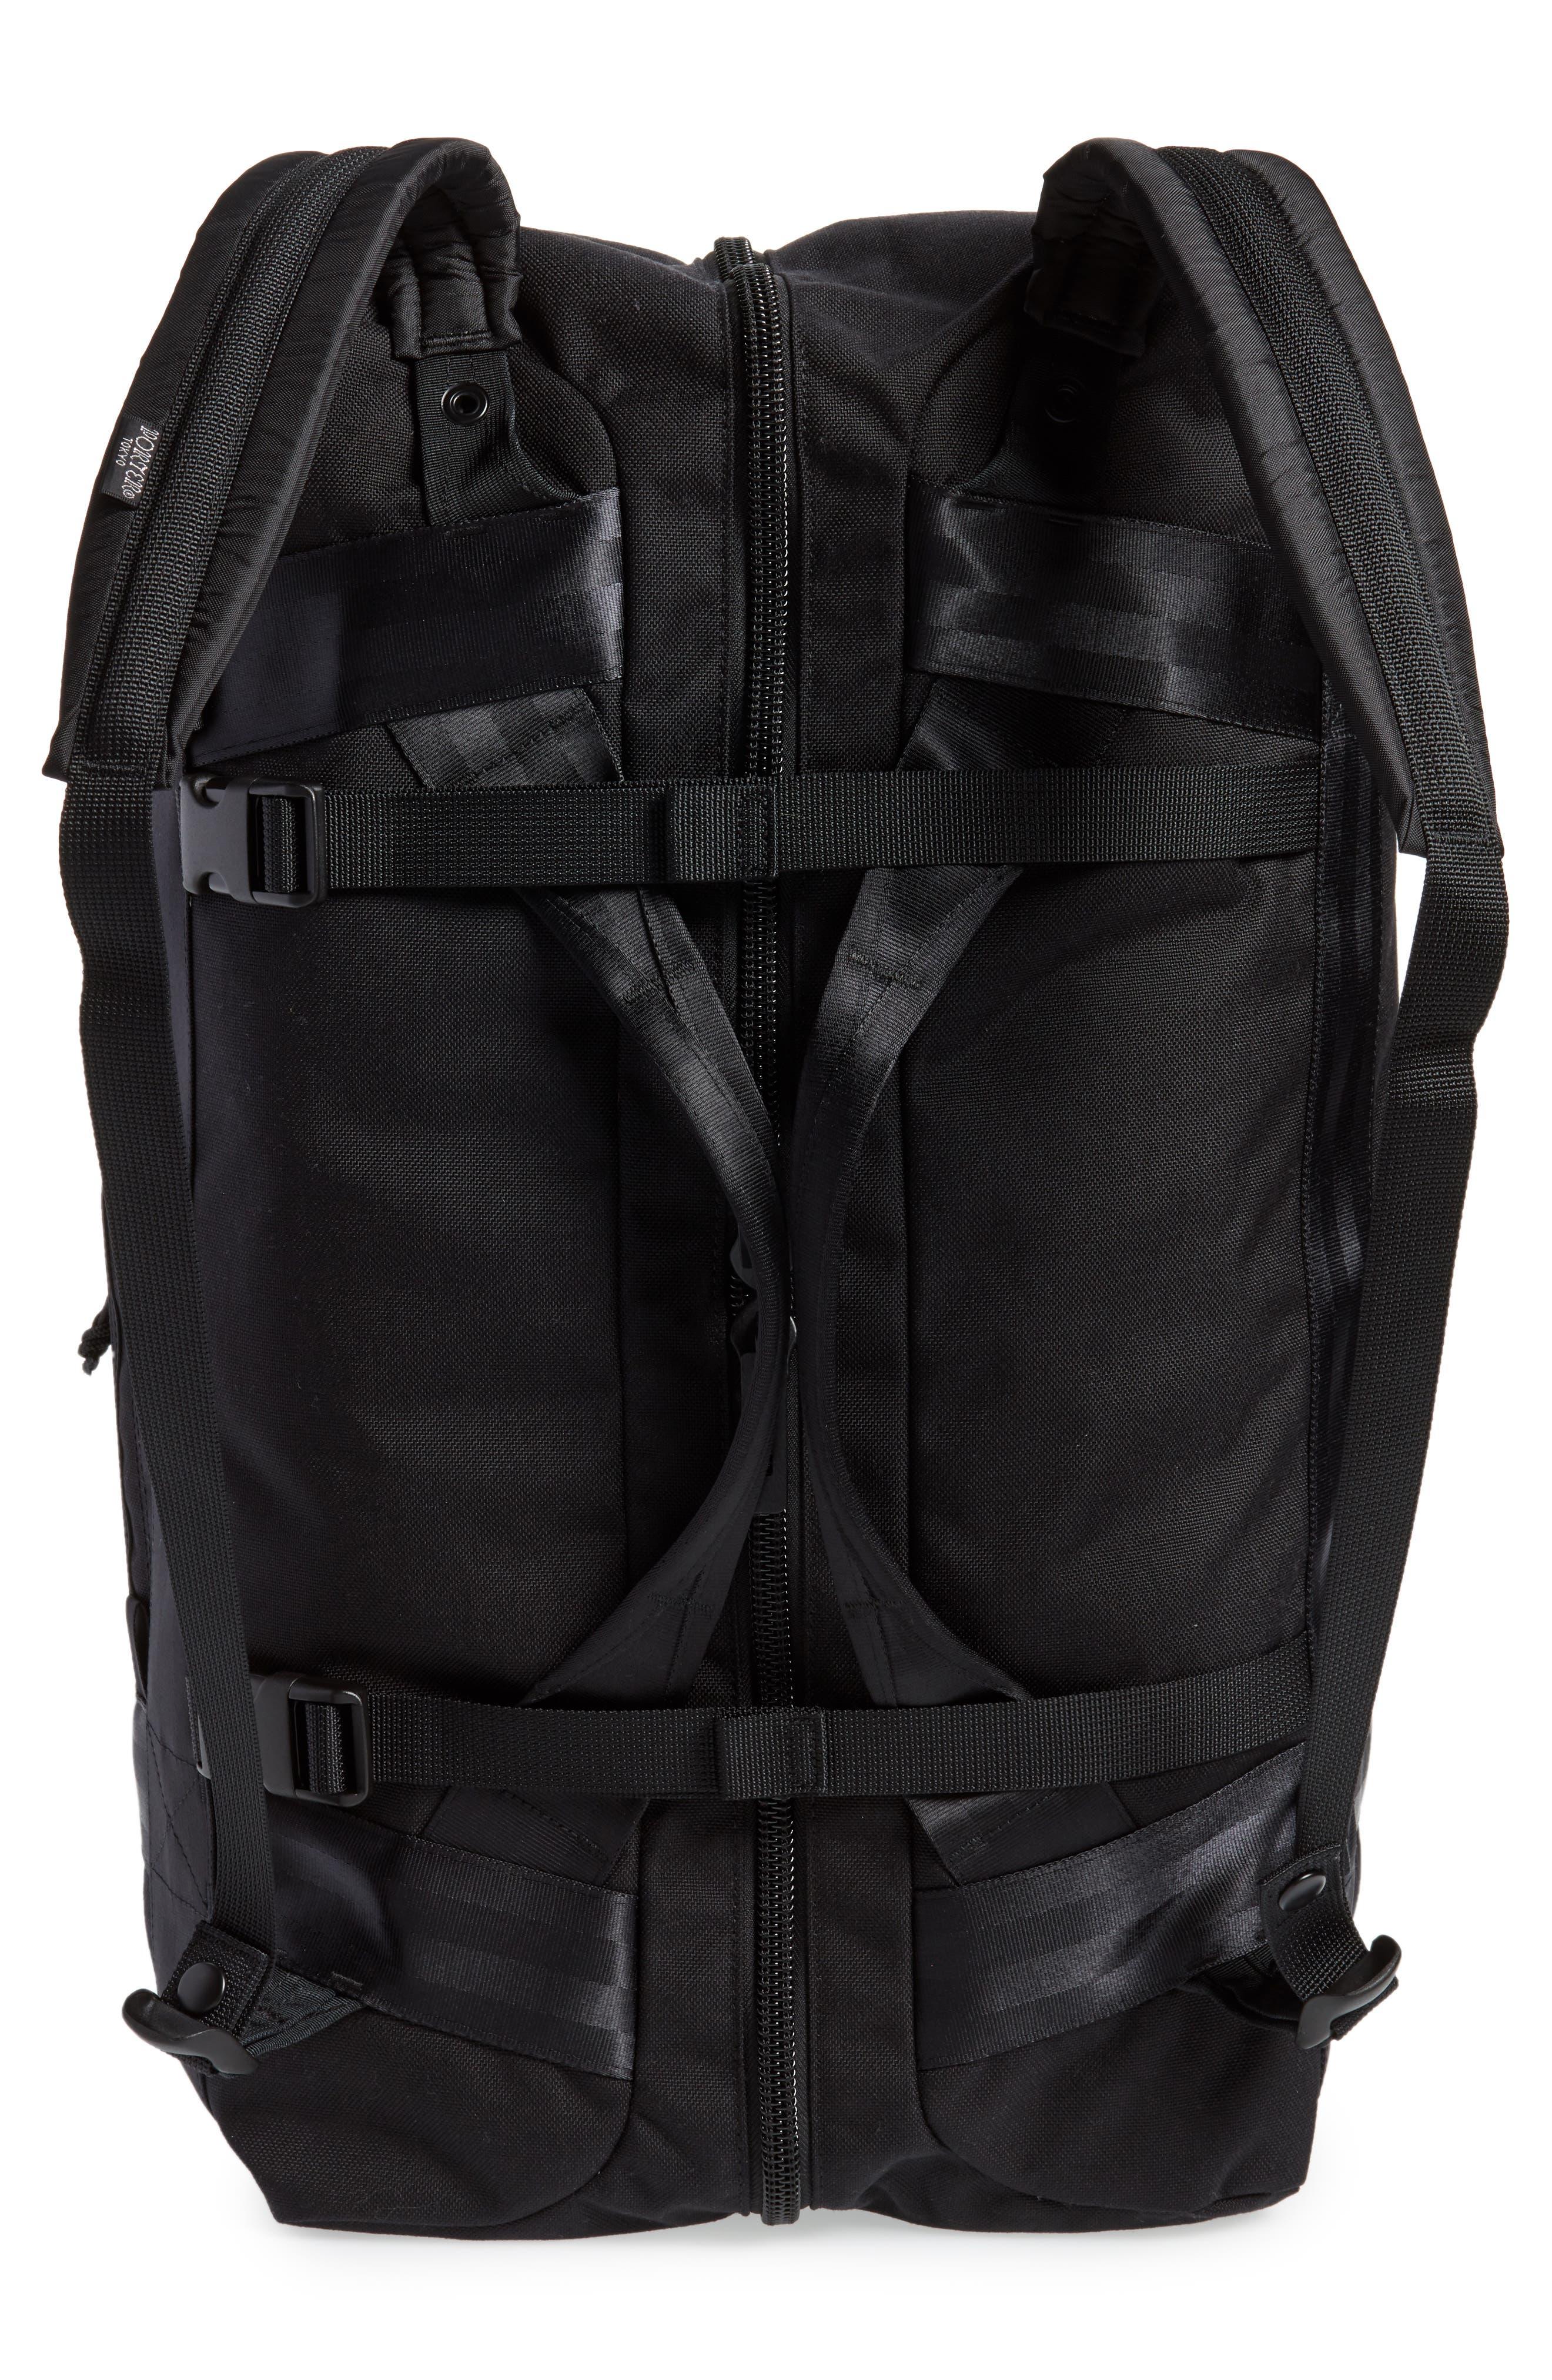 Porter-Yoshida & Co. Boothpack Convertible Duffel Bag,                             Alternate thumbnail 3, color,                             BLACK